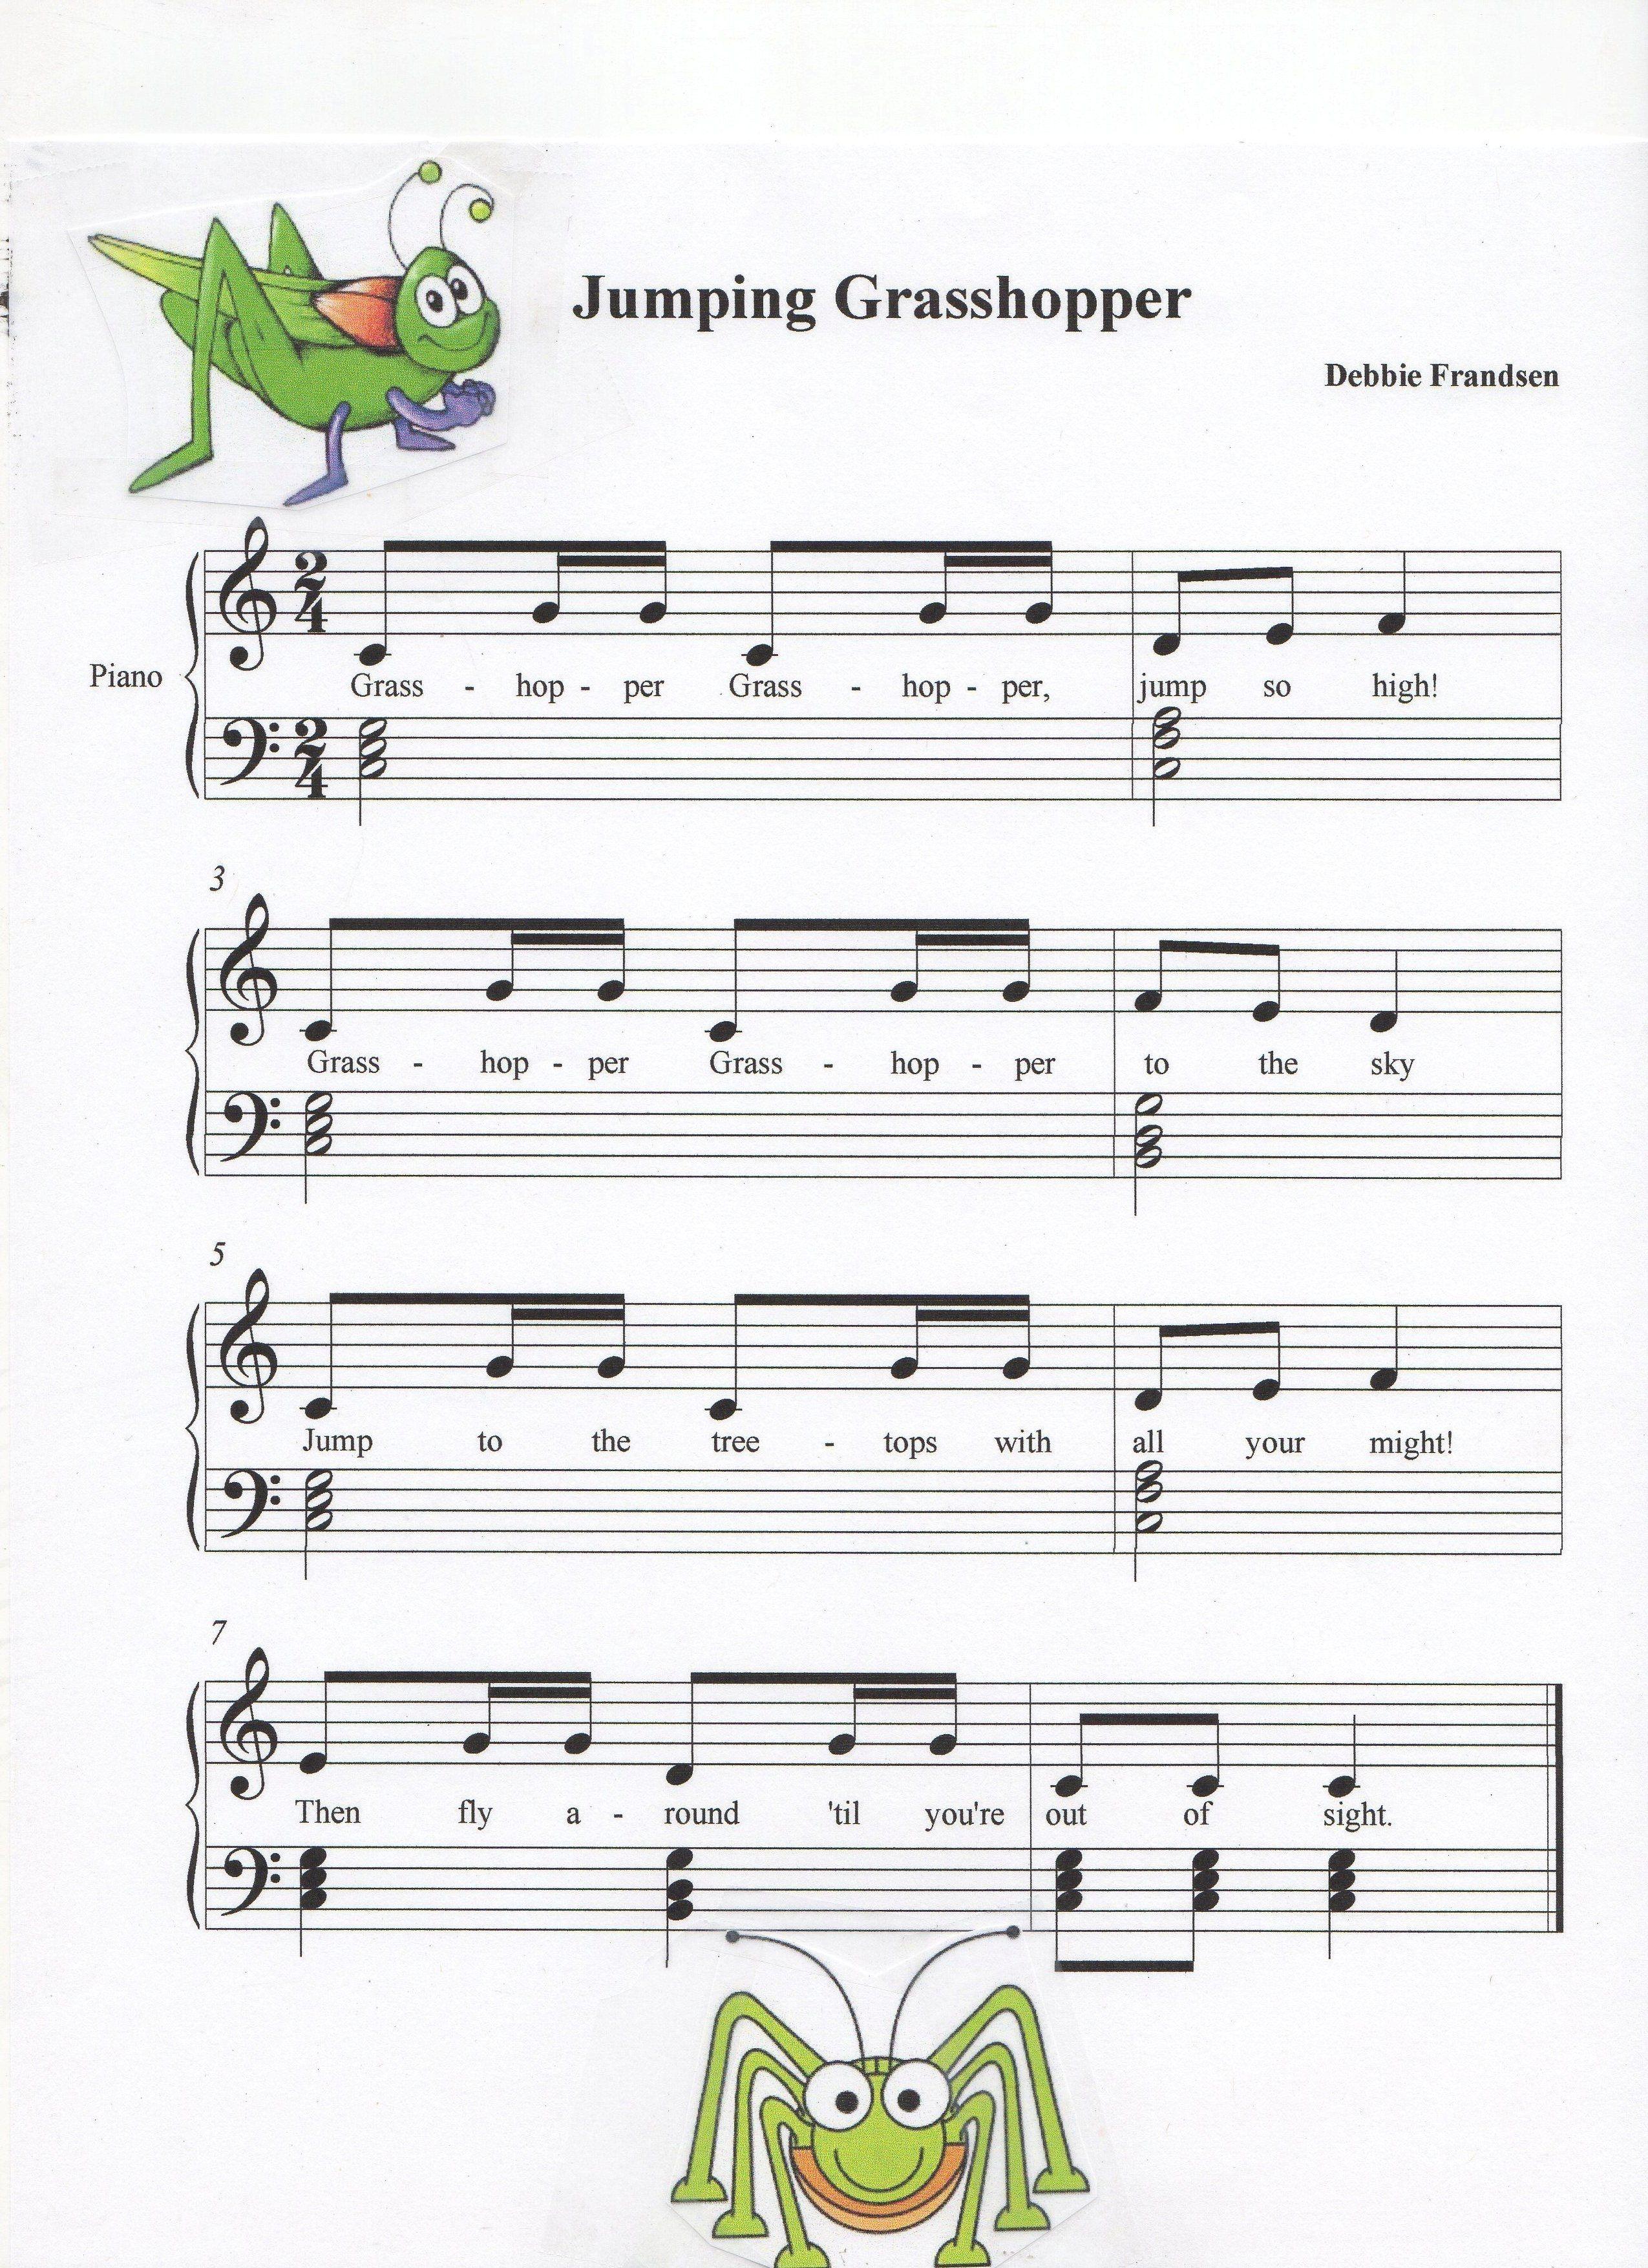 Jumping Grasshopper Piano Music Piano Music Lessons Saxophone Sheet Music [ 3509 x 2550 Pixel ]